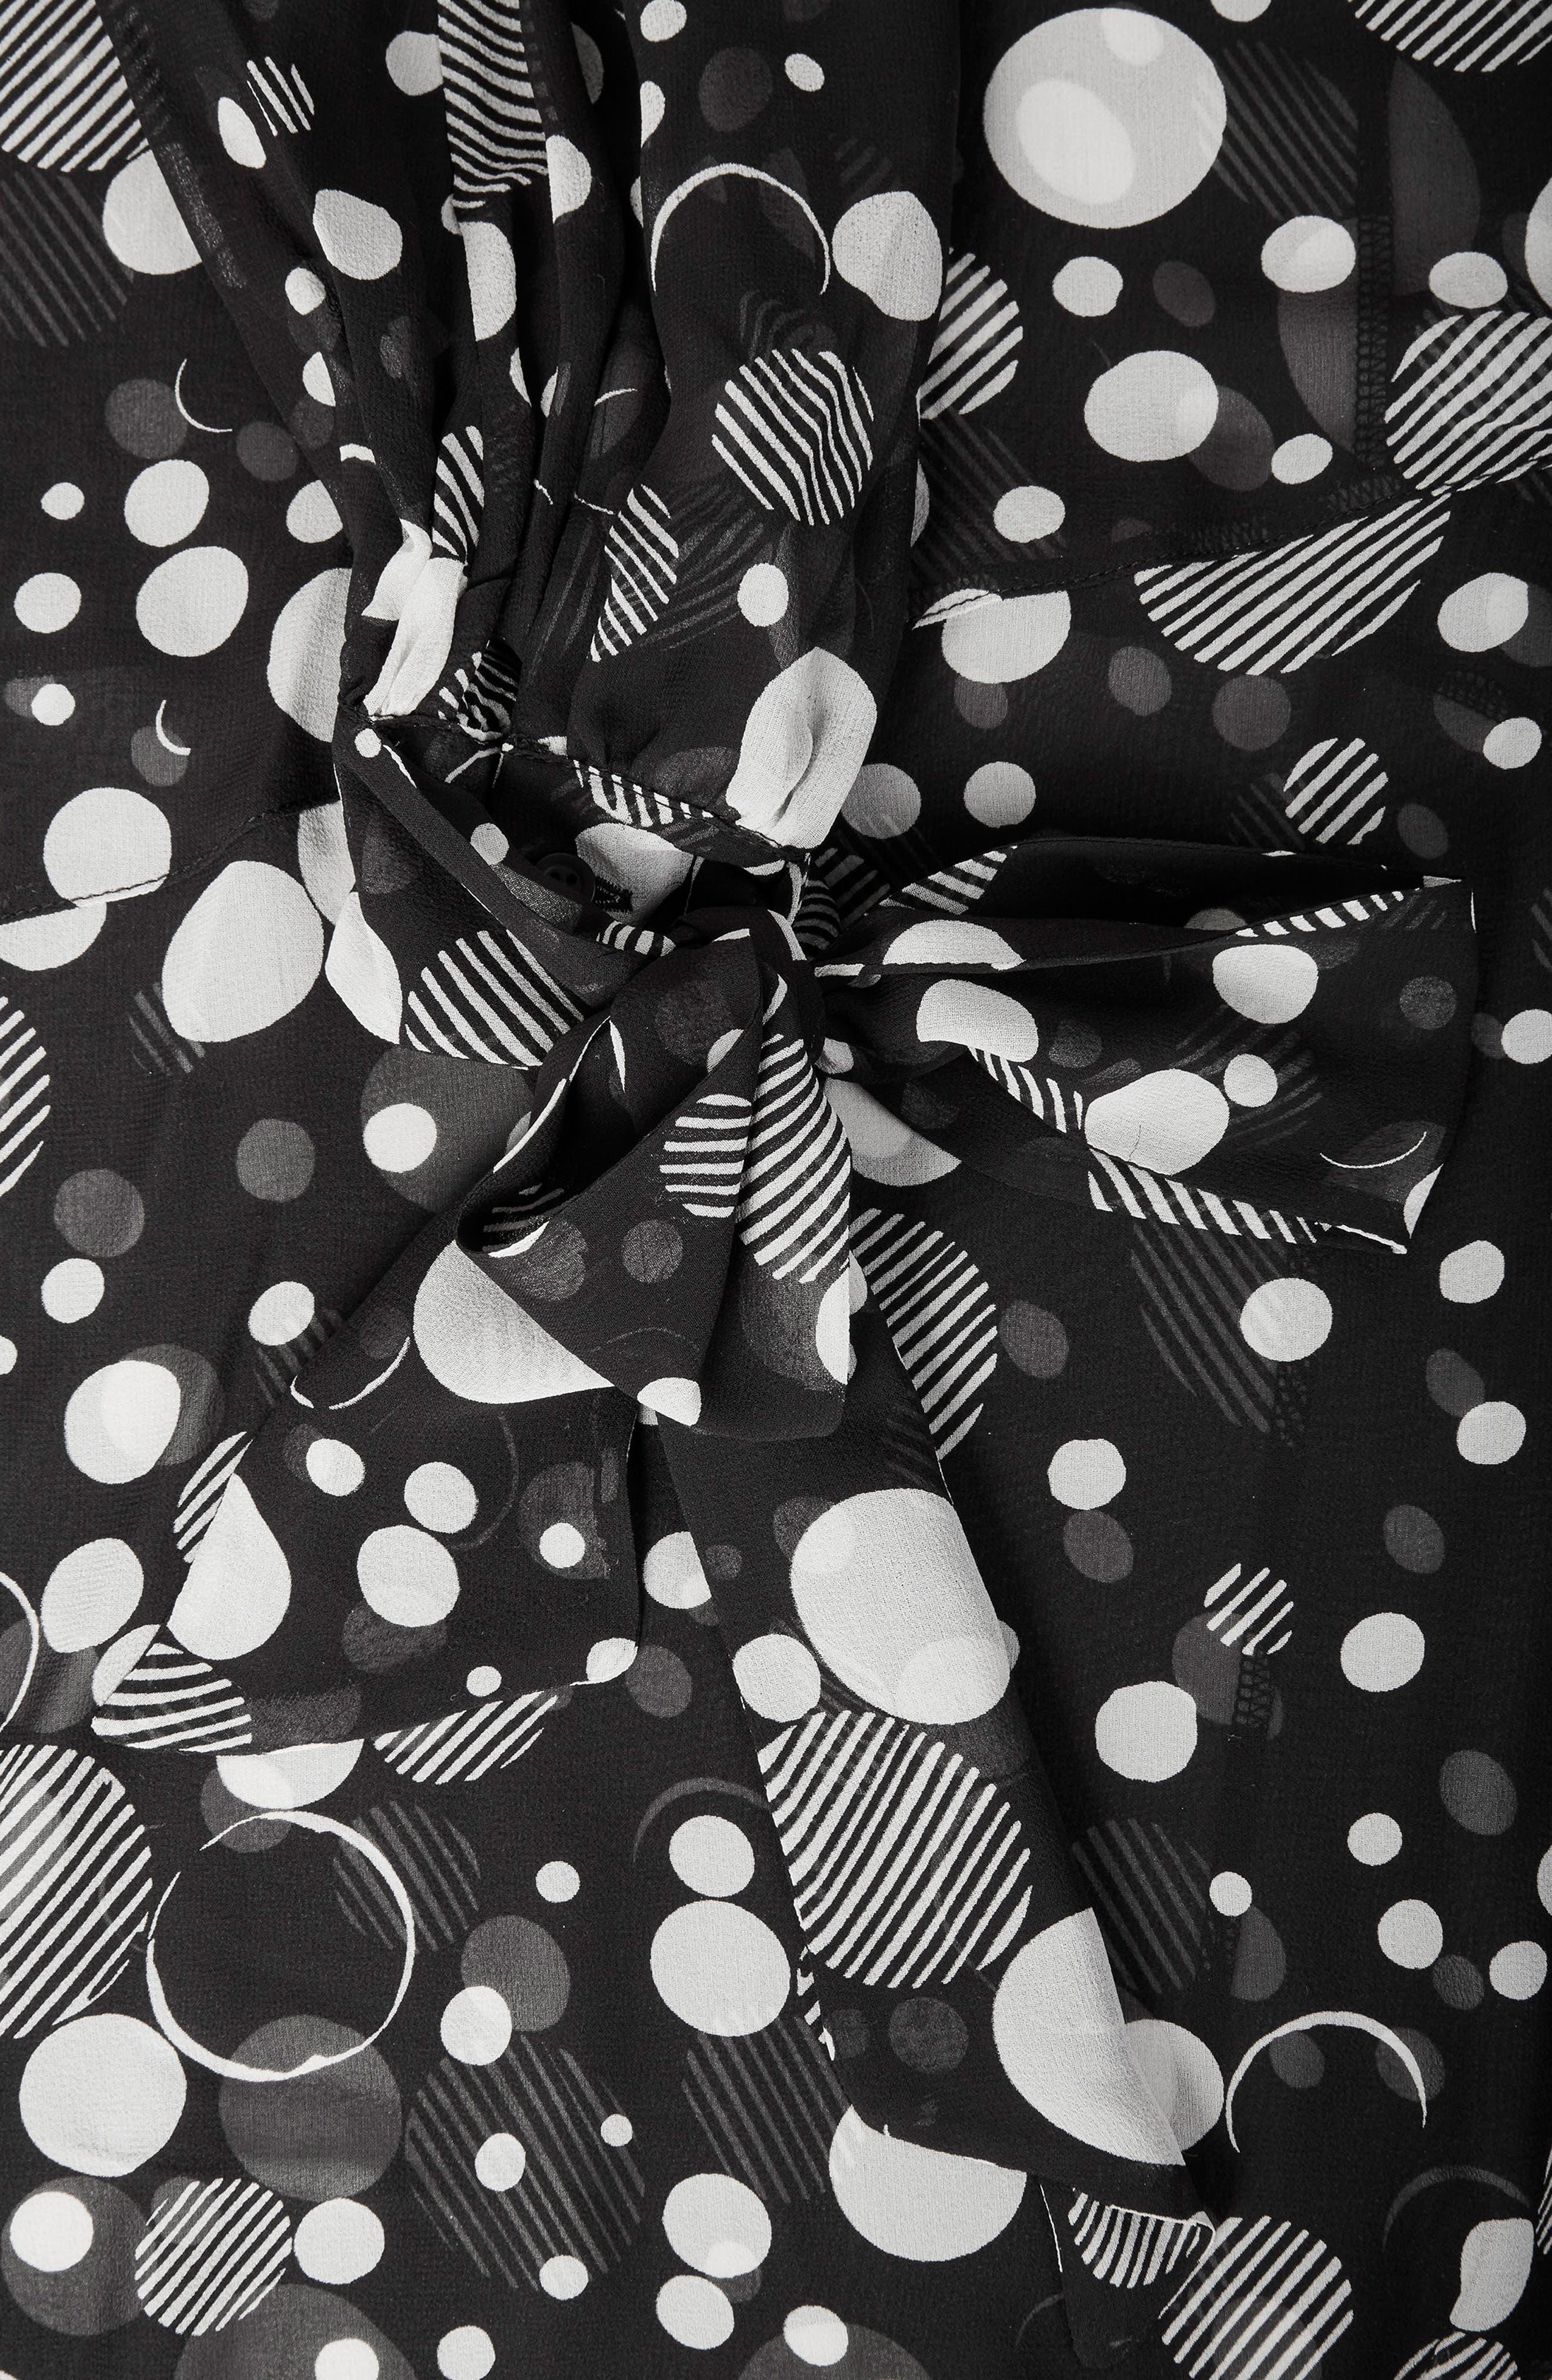 Boutique Humbug Gospel Silk Dress,                             Alternate thumbnail 3, color,